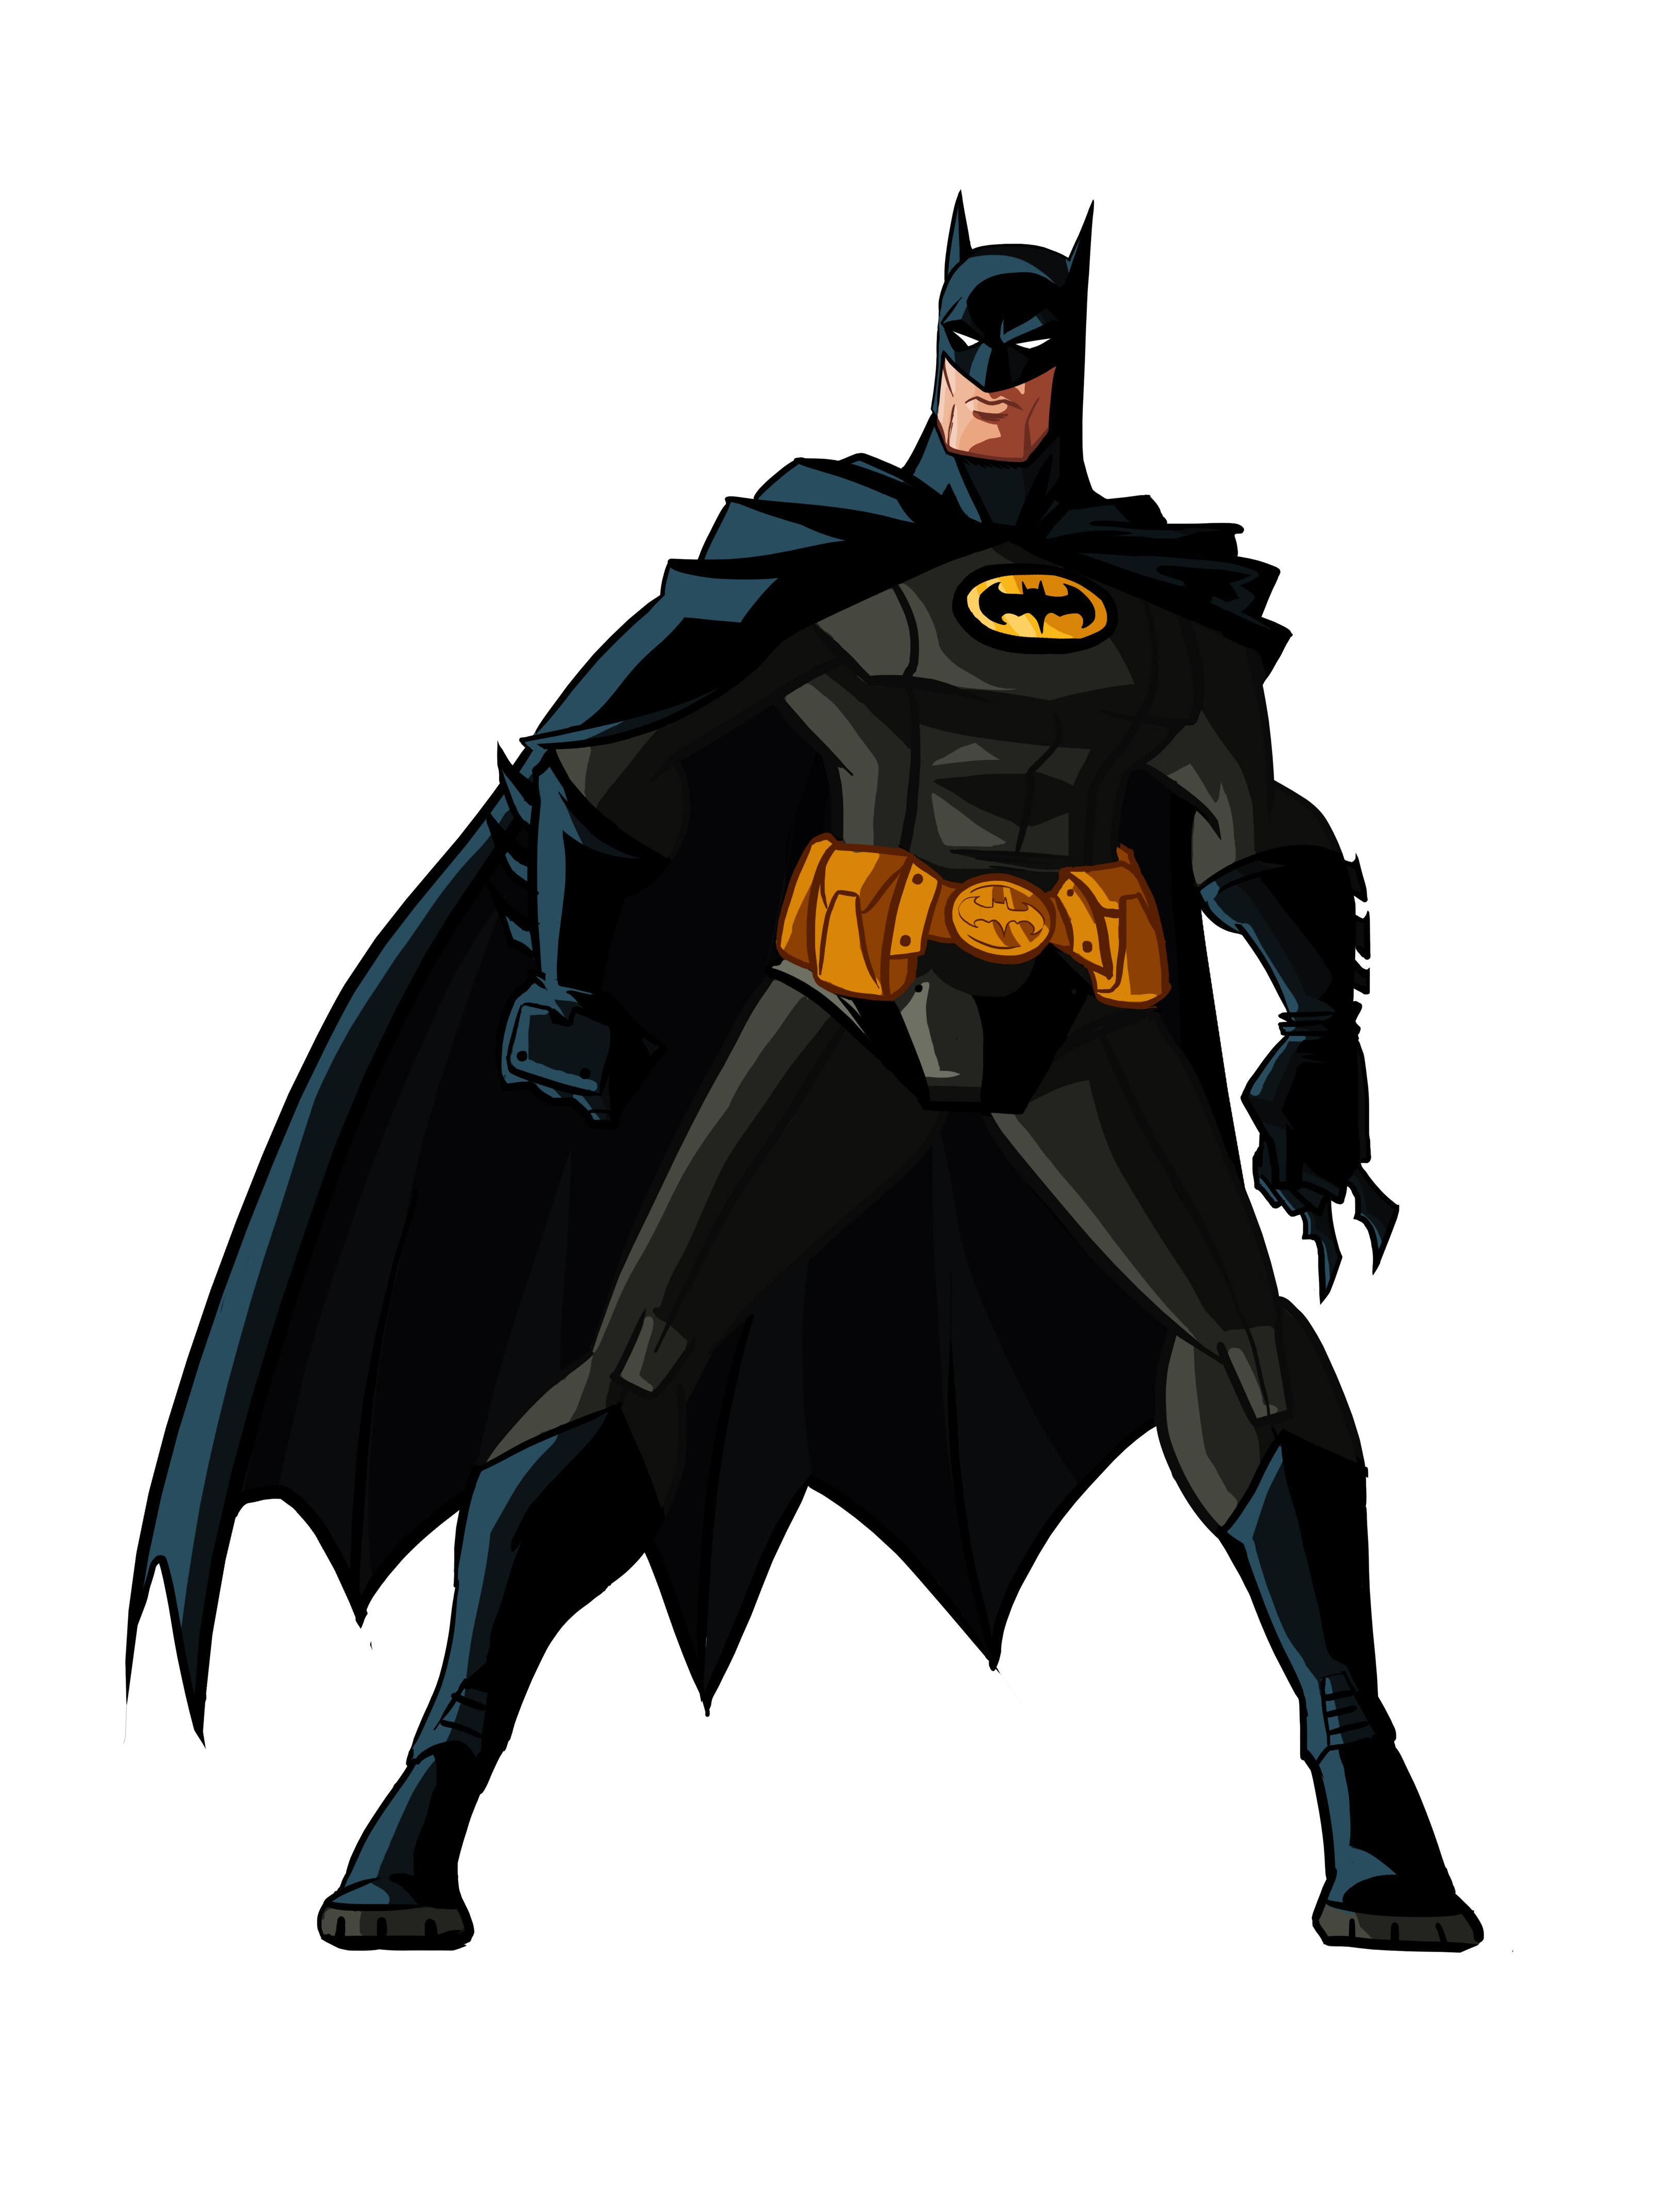 Batman clipart pictures clip black and white download Batman Clipart Images | Free download best Batman Clipart Images on ... clip black and white download